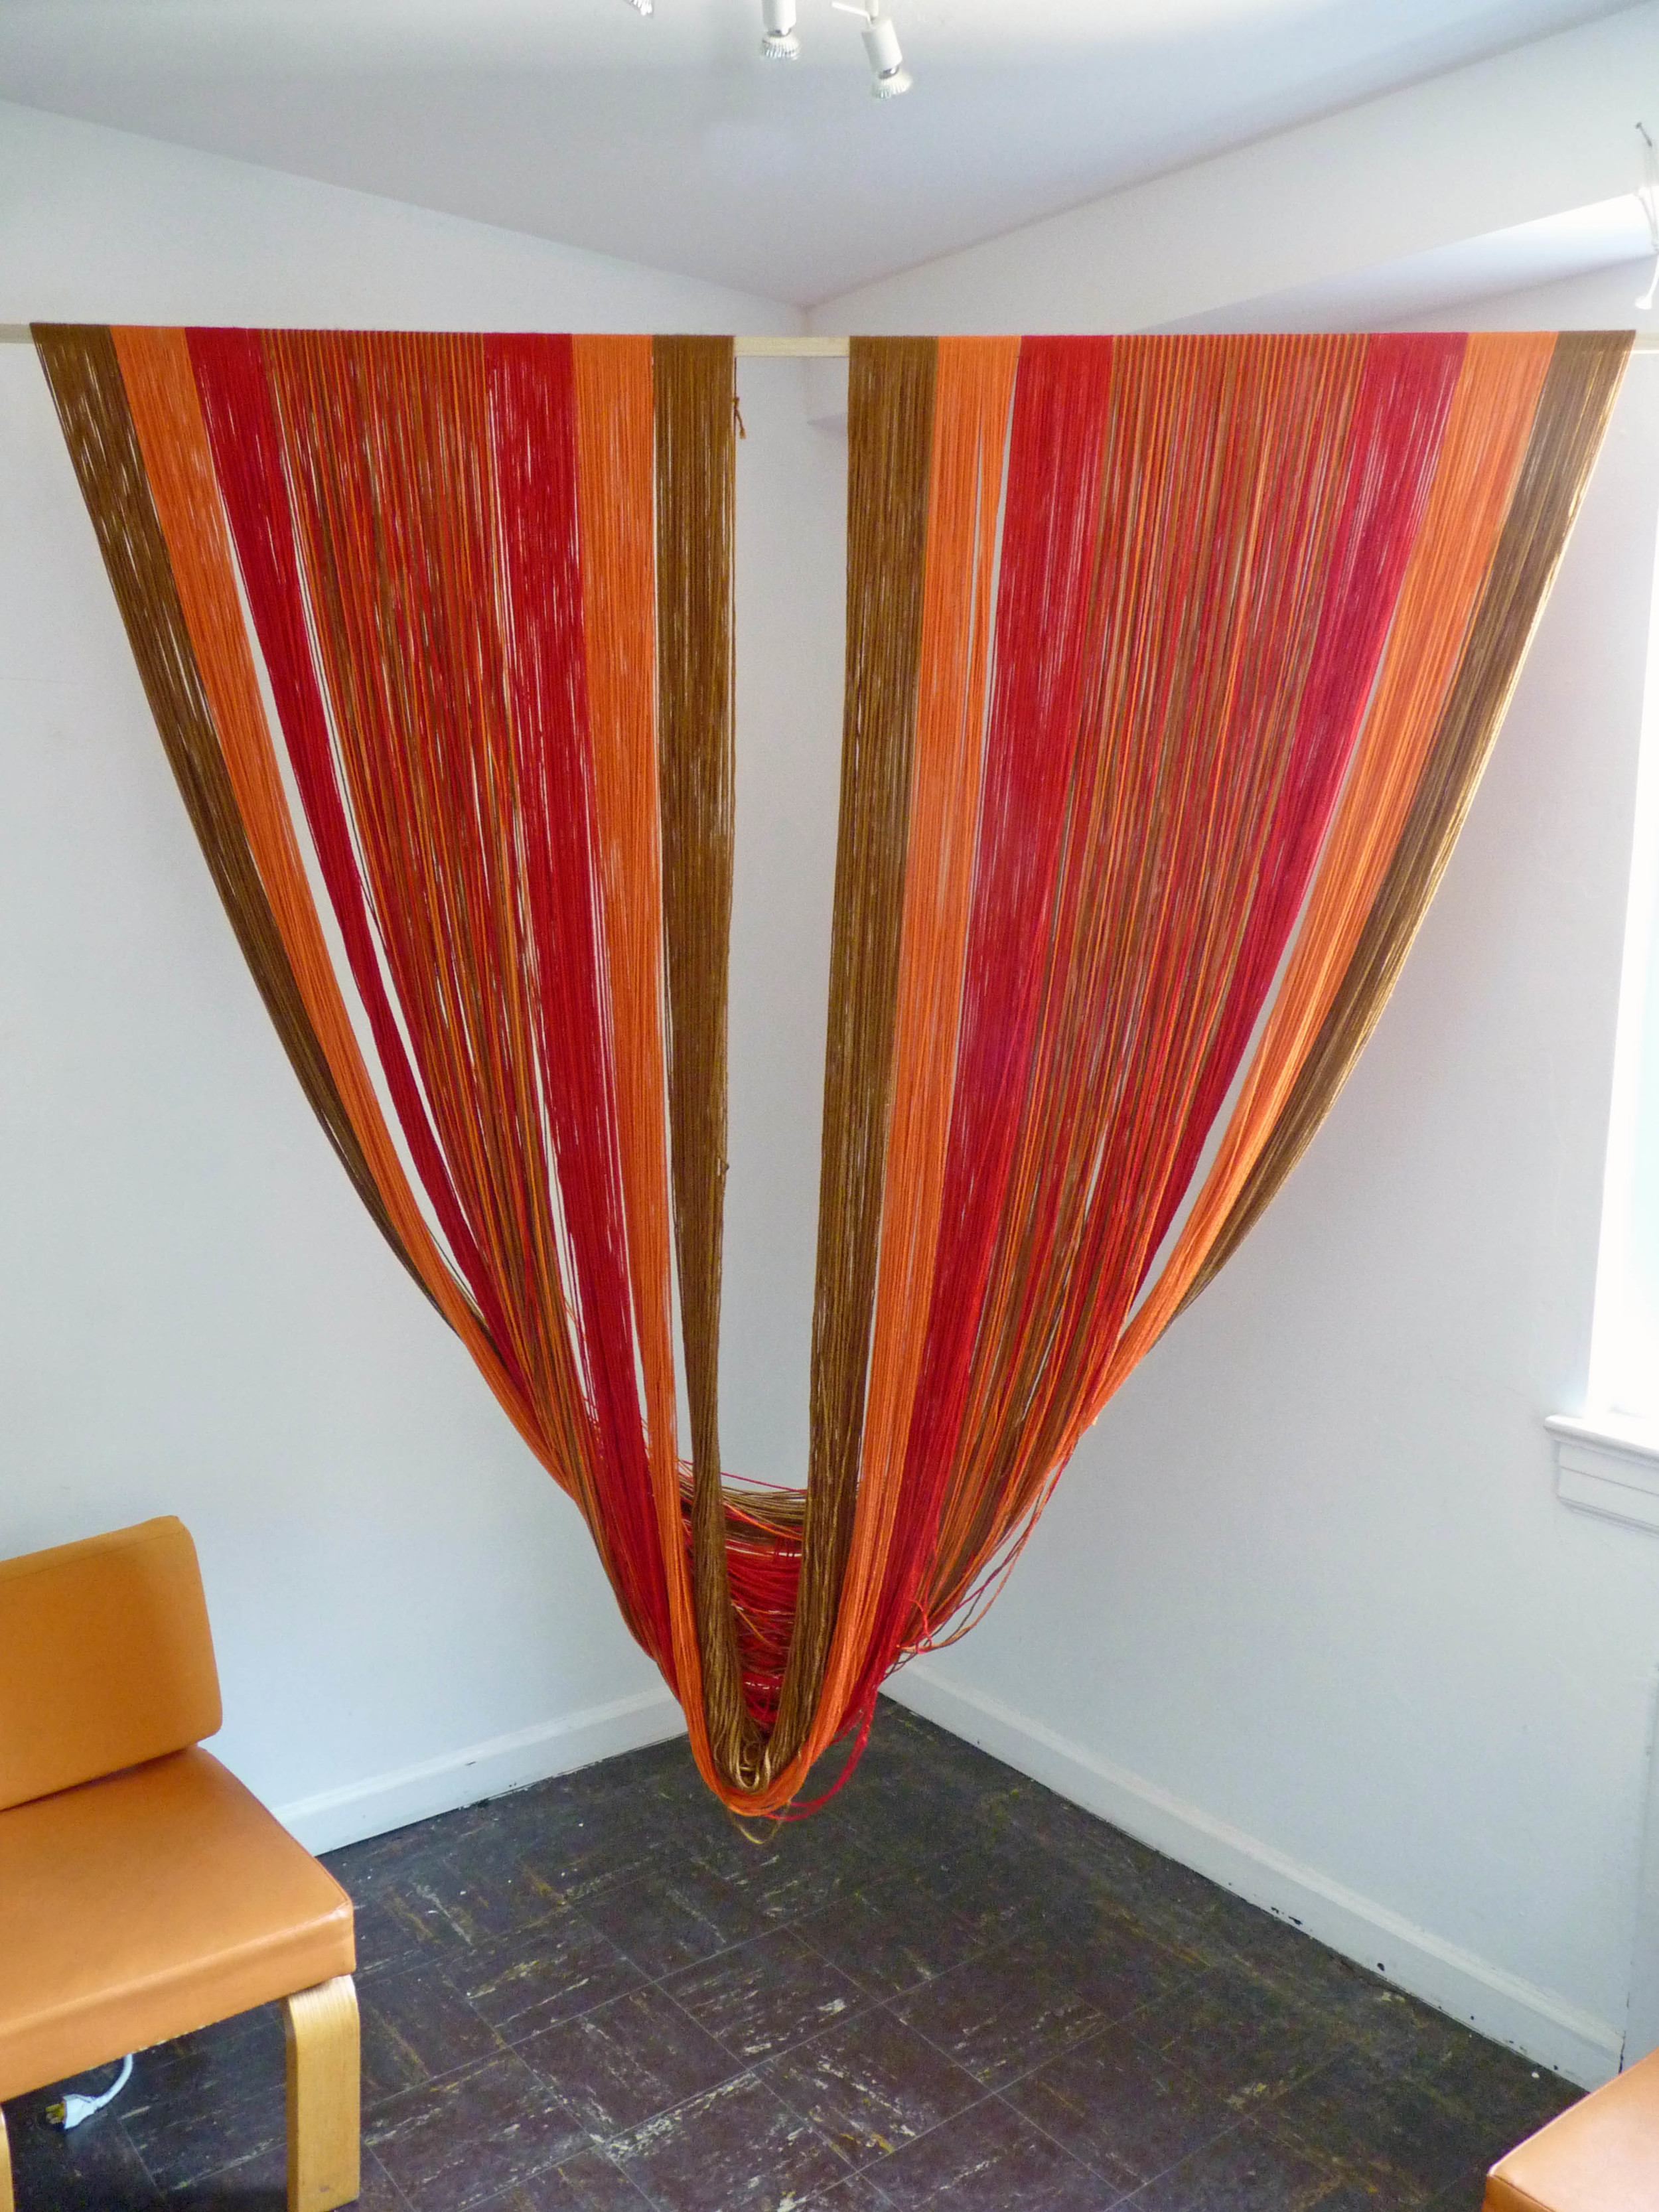 Corners for Seasons Fall, 2015, Acrylic yarn, wood, 7' x 6'